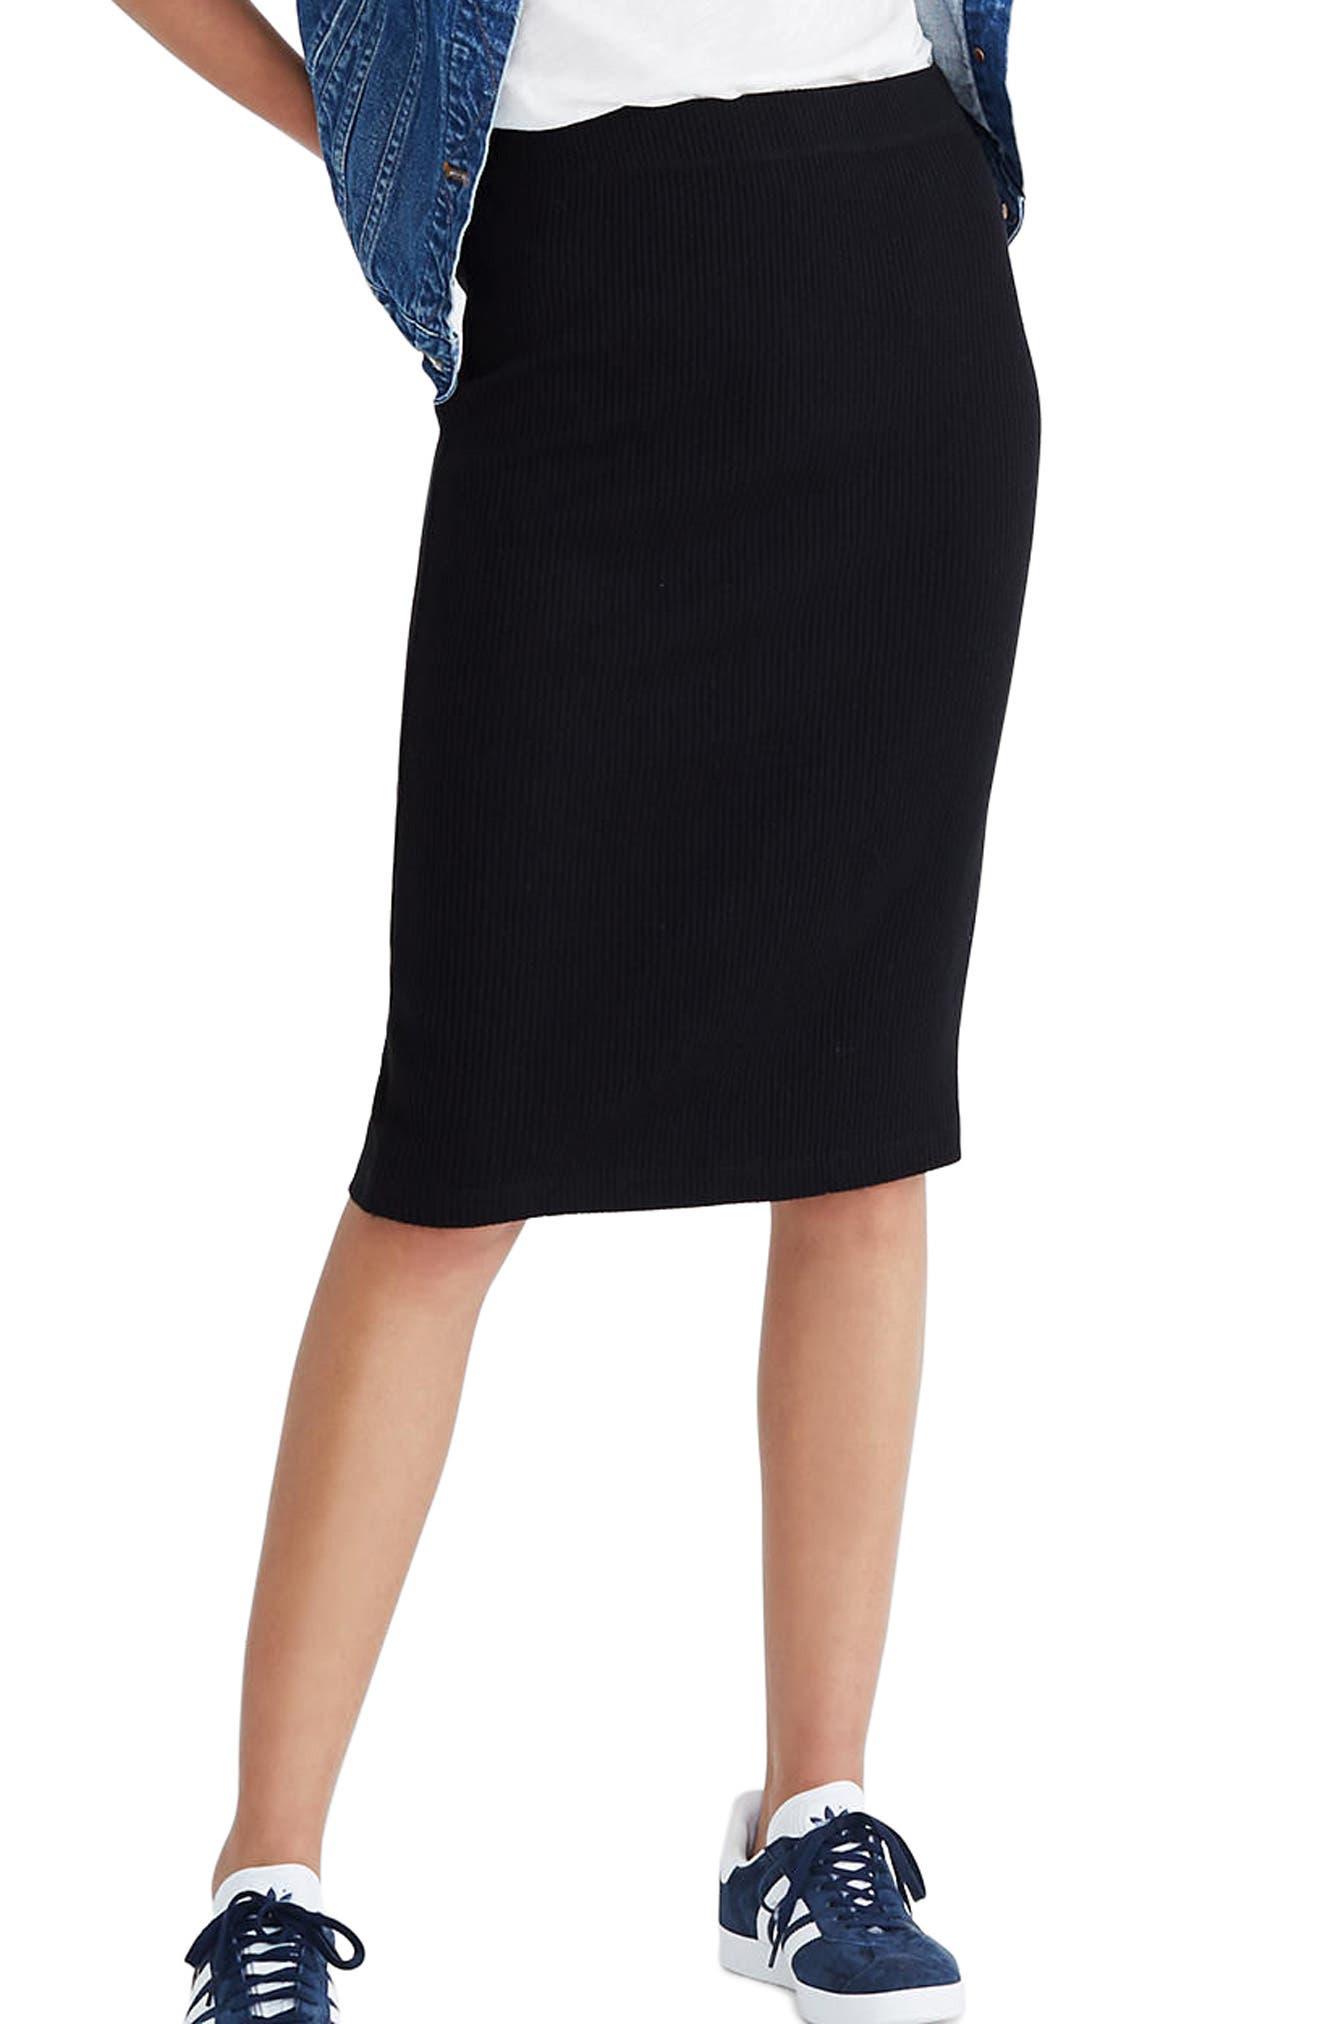 Ribbed Pencil Skirt,                         Main,                         color, True Black